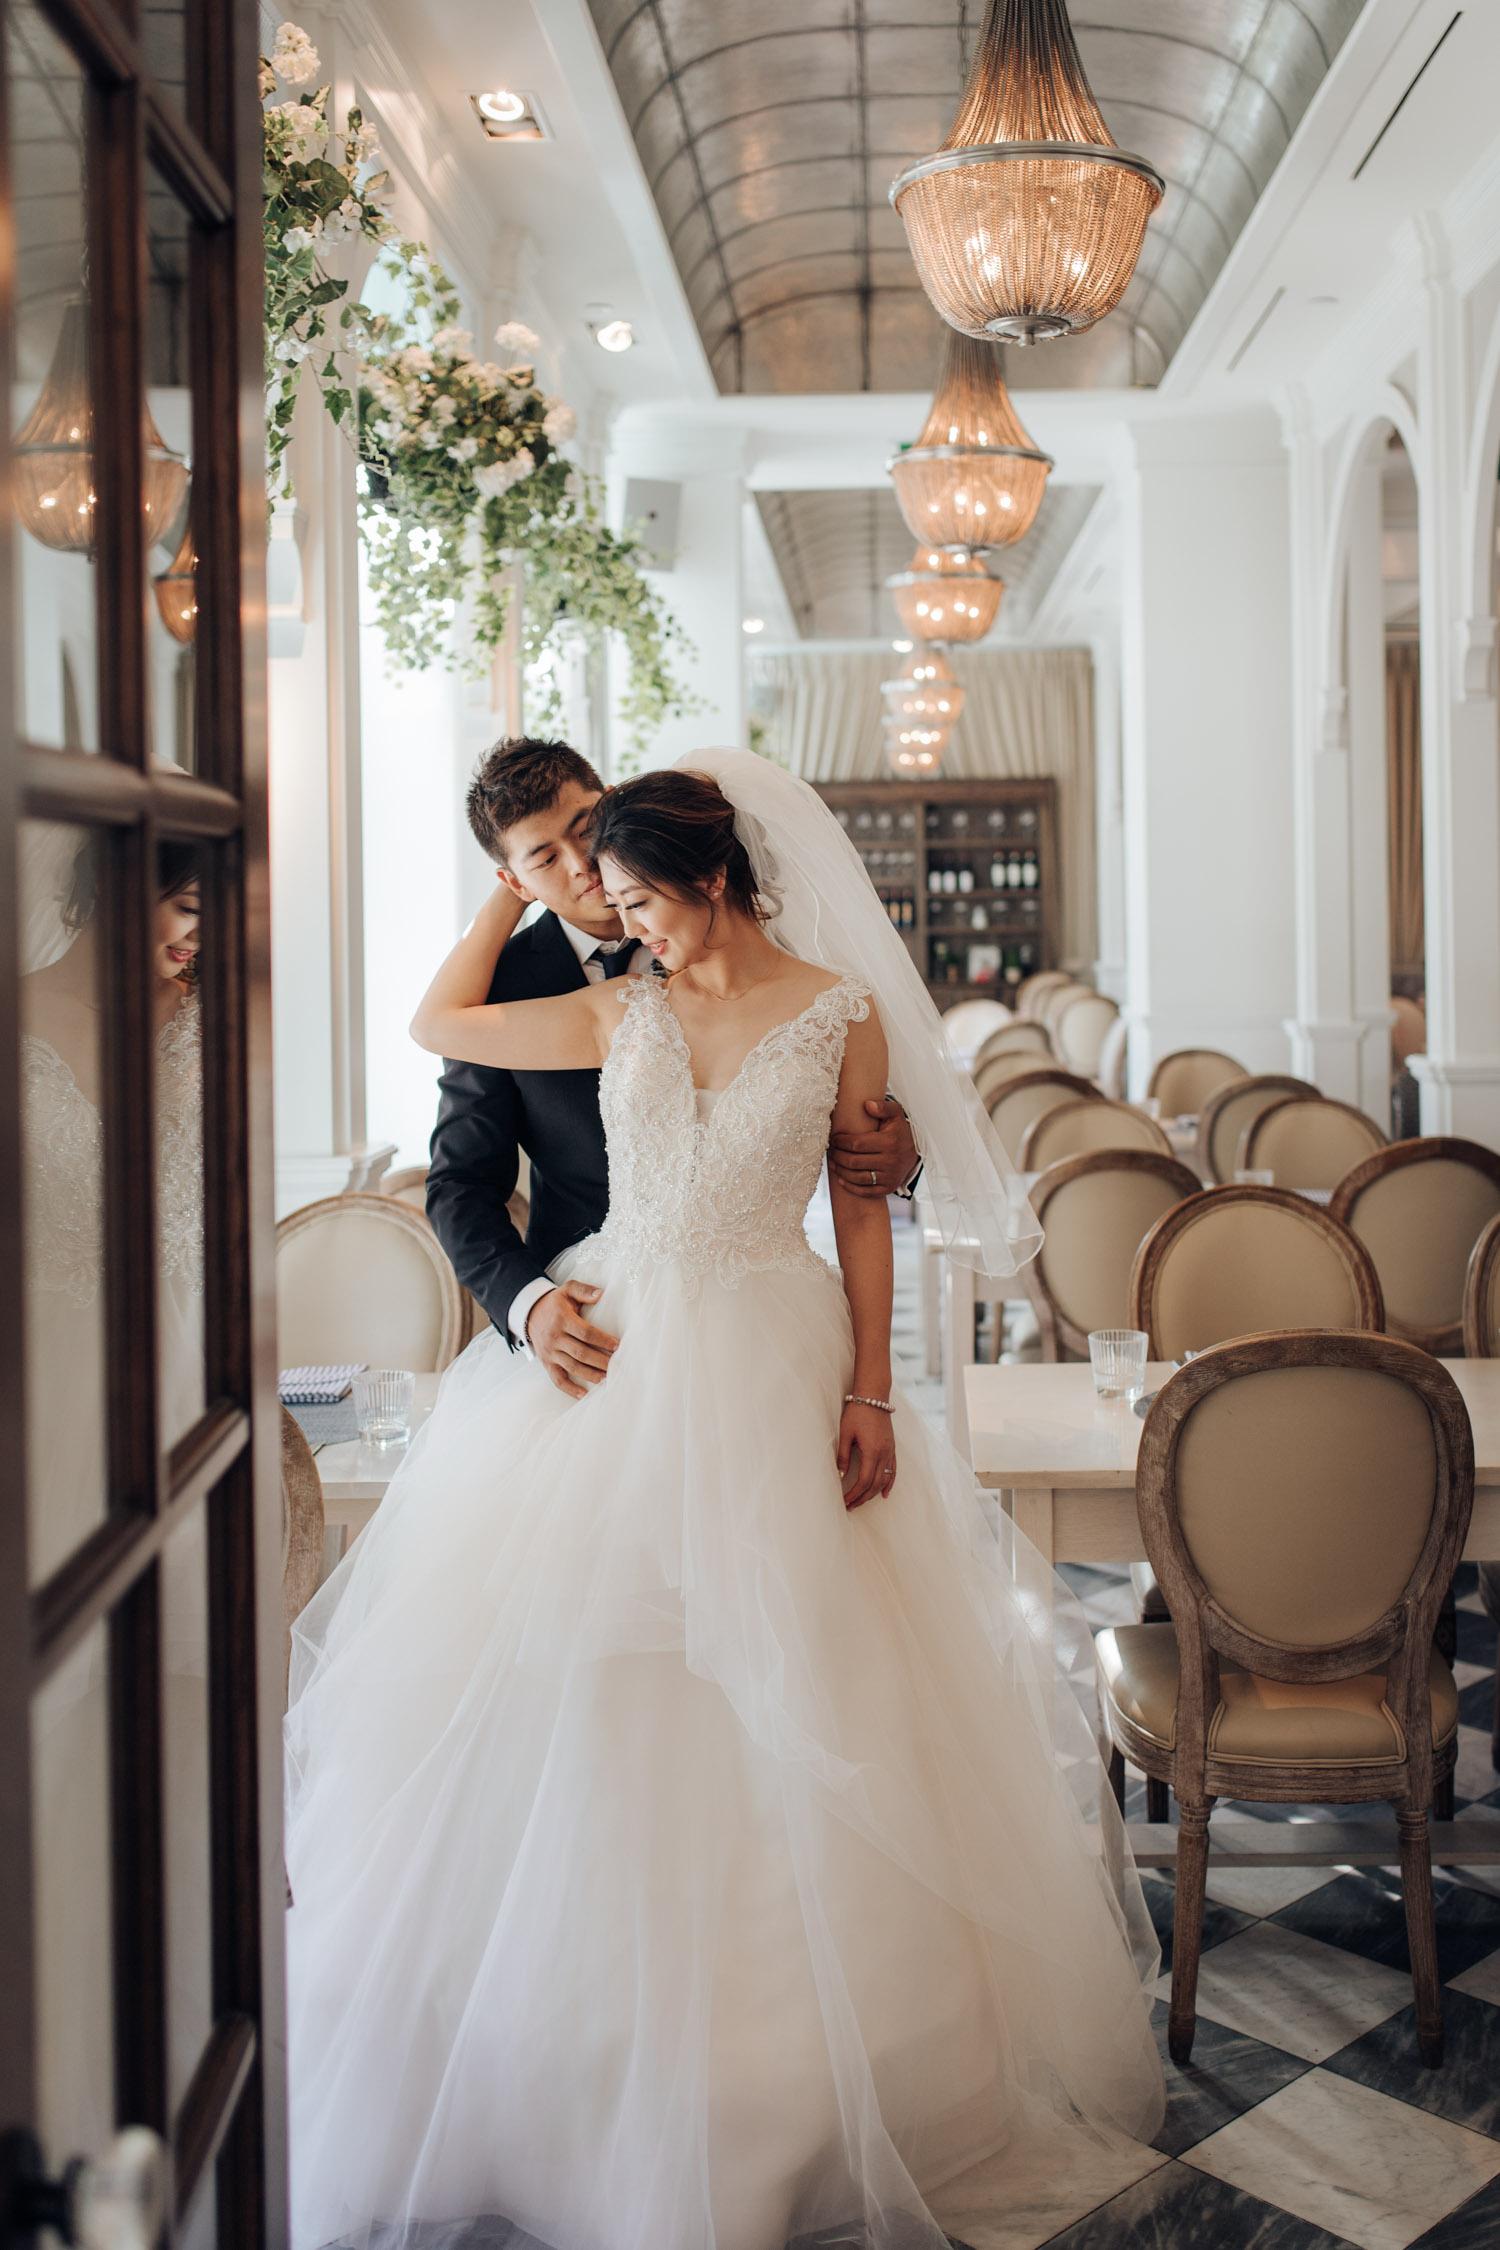 Toronto Colette grand cafe Wedding Indoor Photo